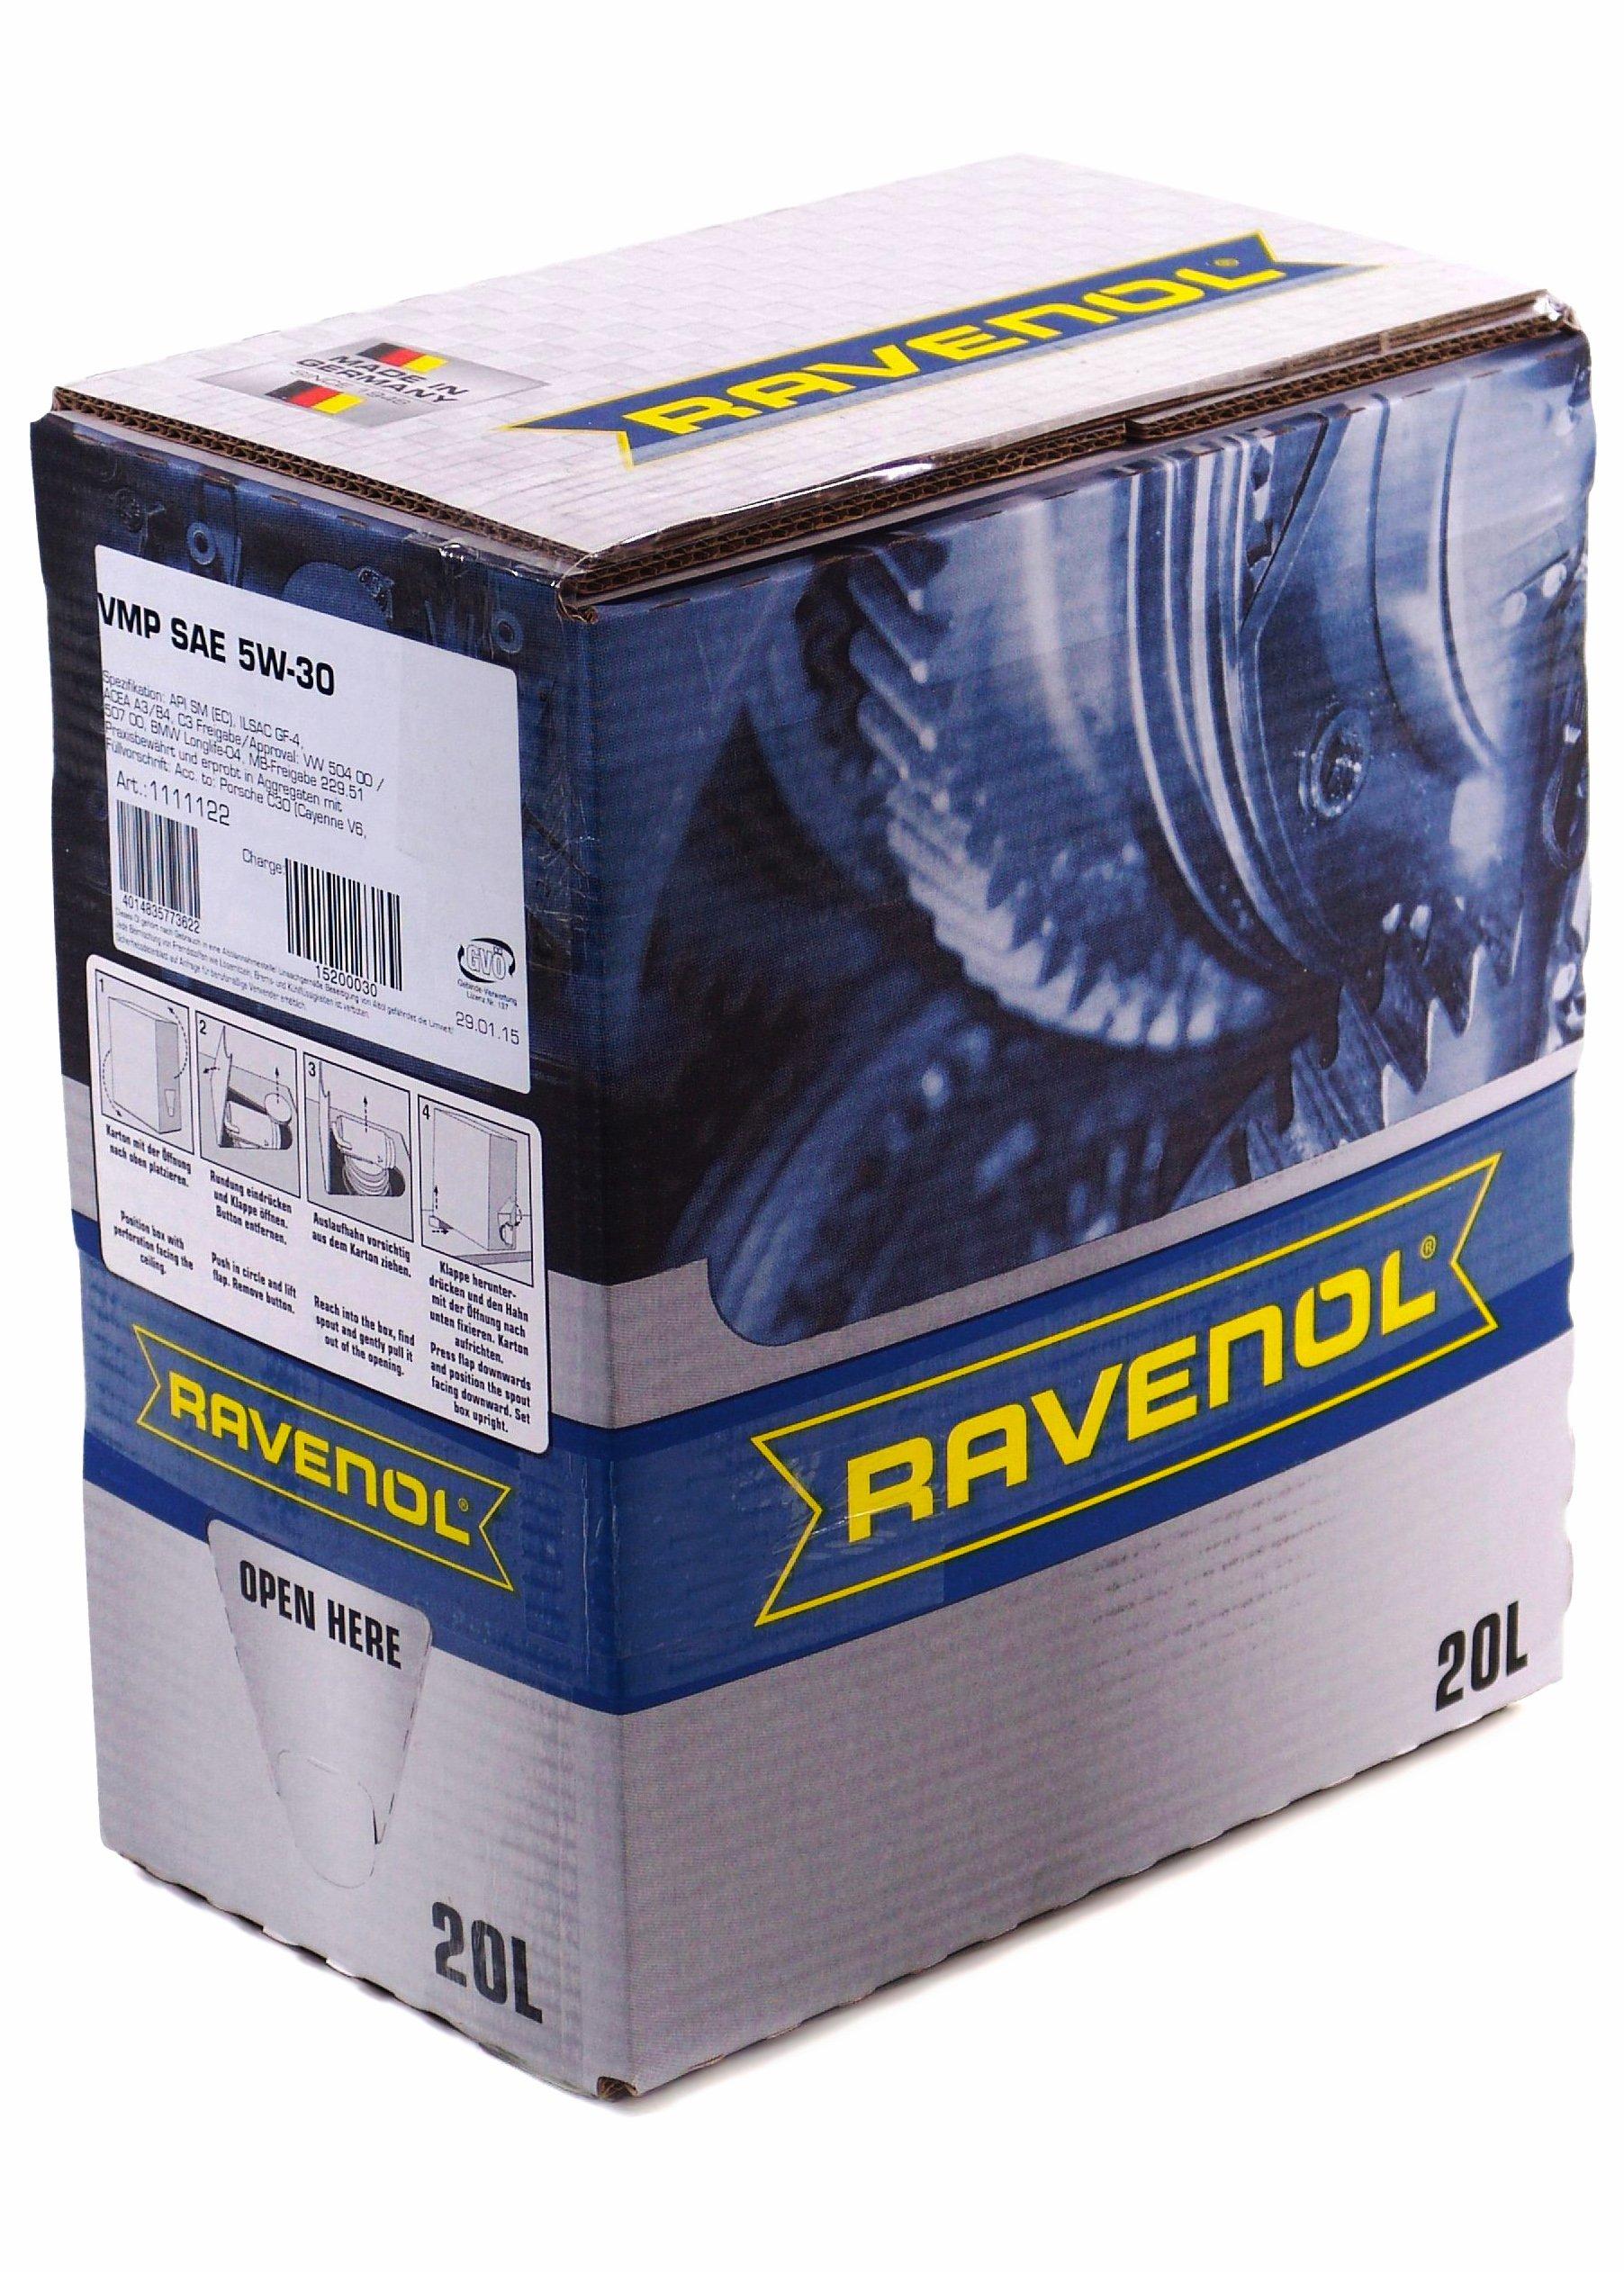 RAVENOL J1A1519-BiB SAE 5W-30 Motor Oil - VMP BMW Longlife-04, MB 229.51, VW 504 00, 507 00 Approved (20L (Bag-in-Box)) by Ravenol